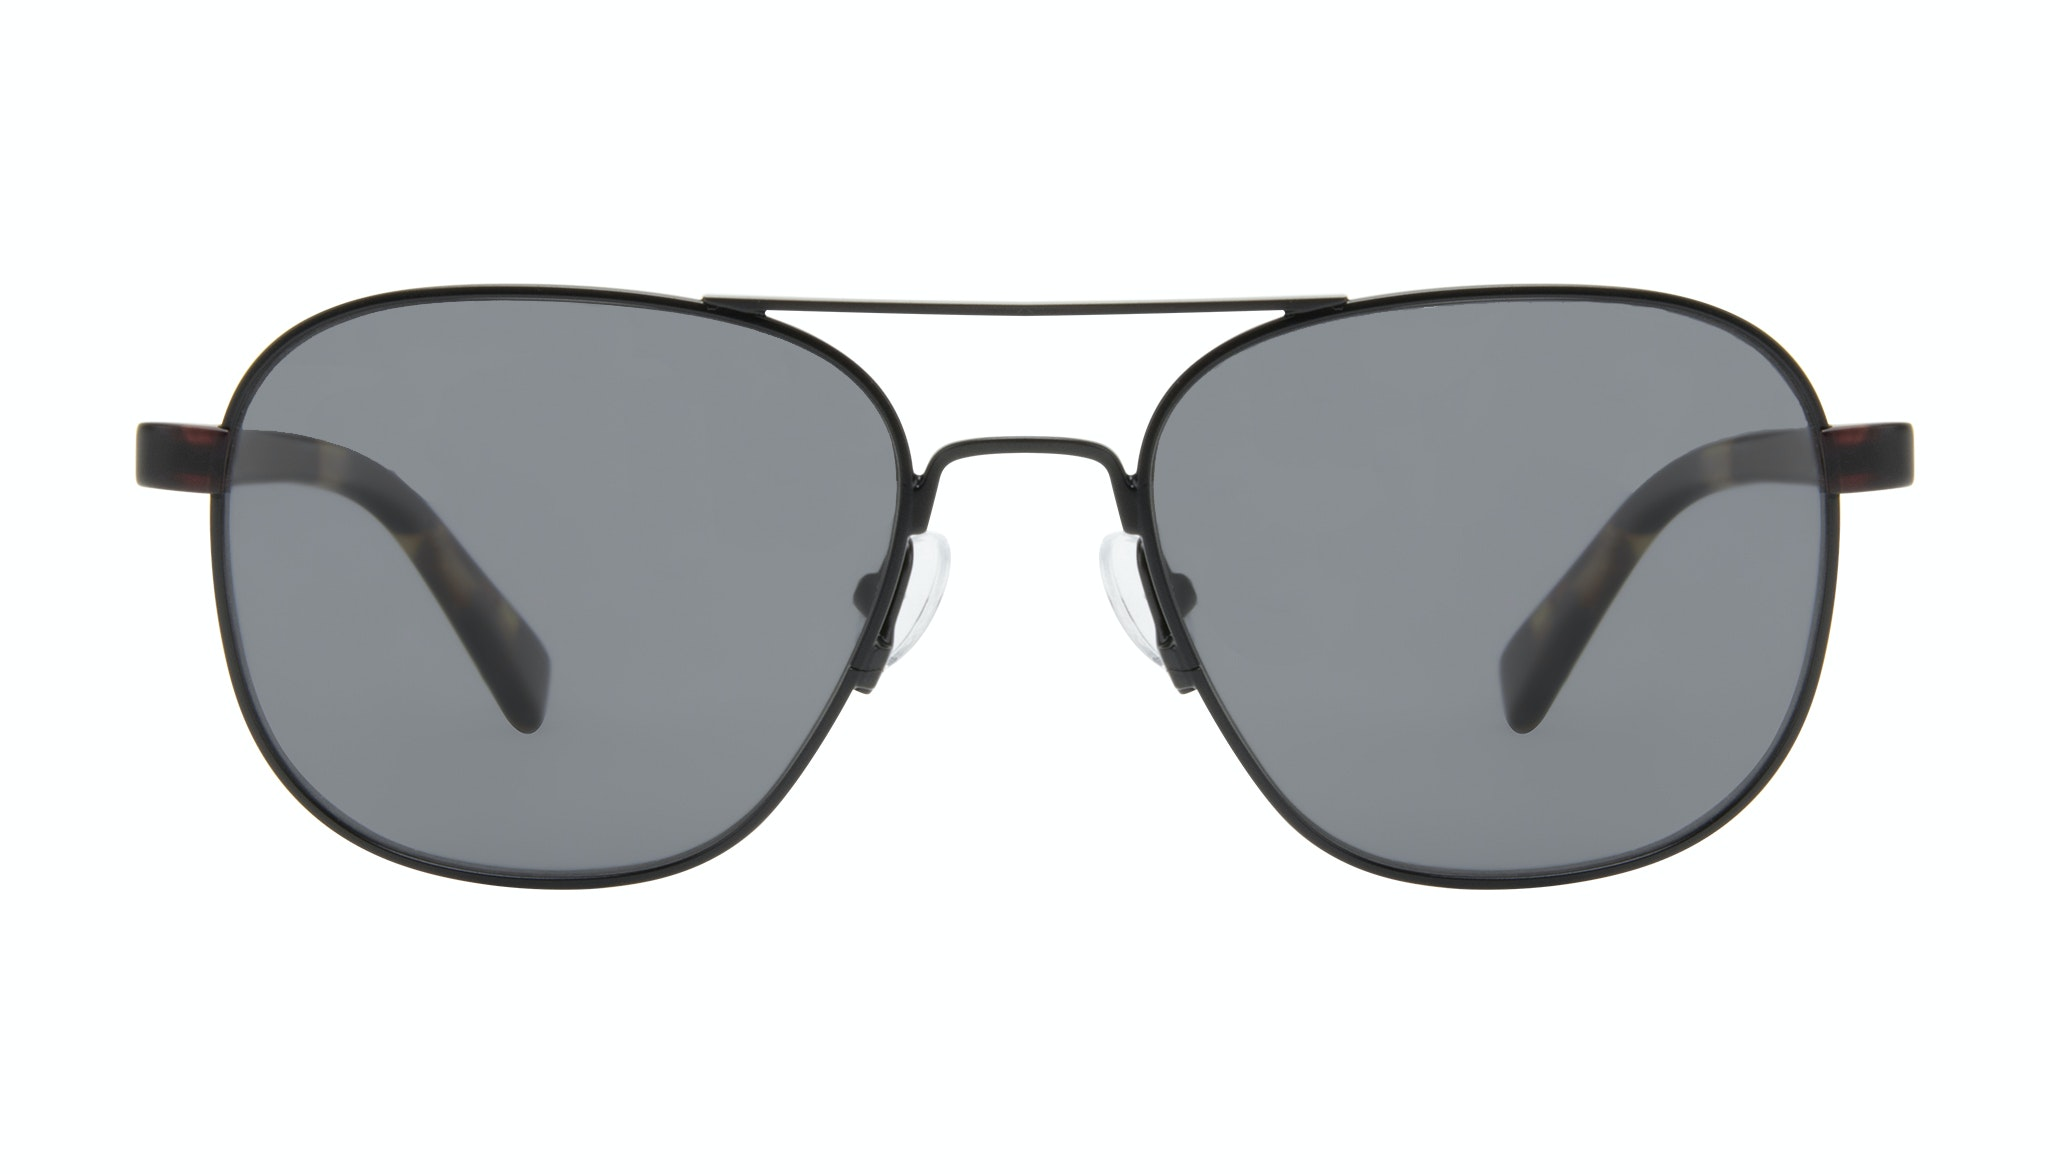 Affordable Fashion Glasses Aviator Sunglasses Men Pulse Gun Metal